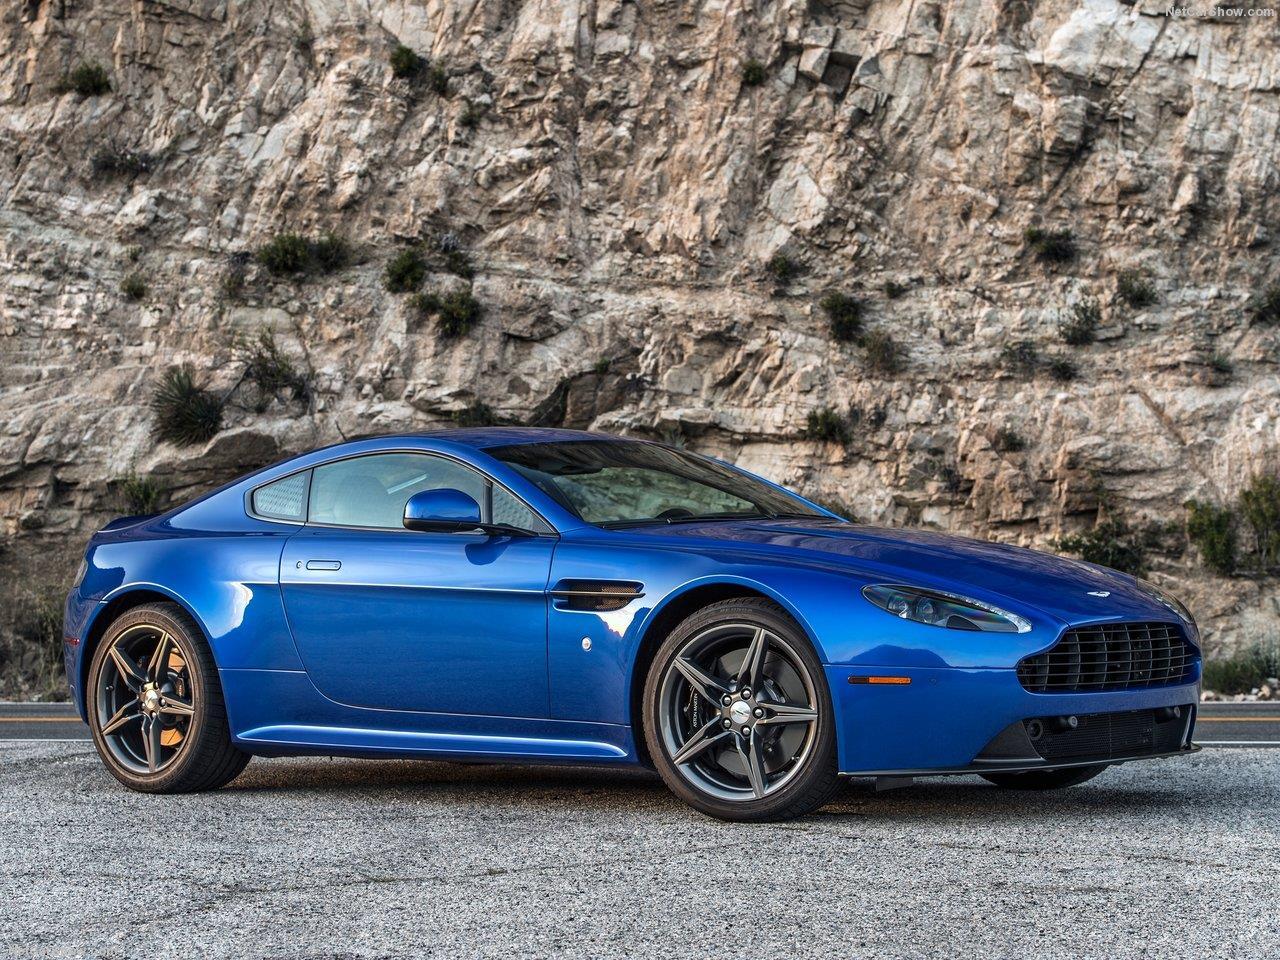 Next-gen Aston Martin Vantage to use AMG V8 engines